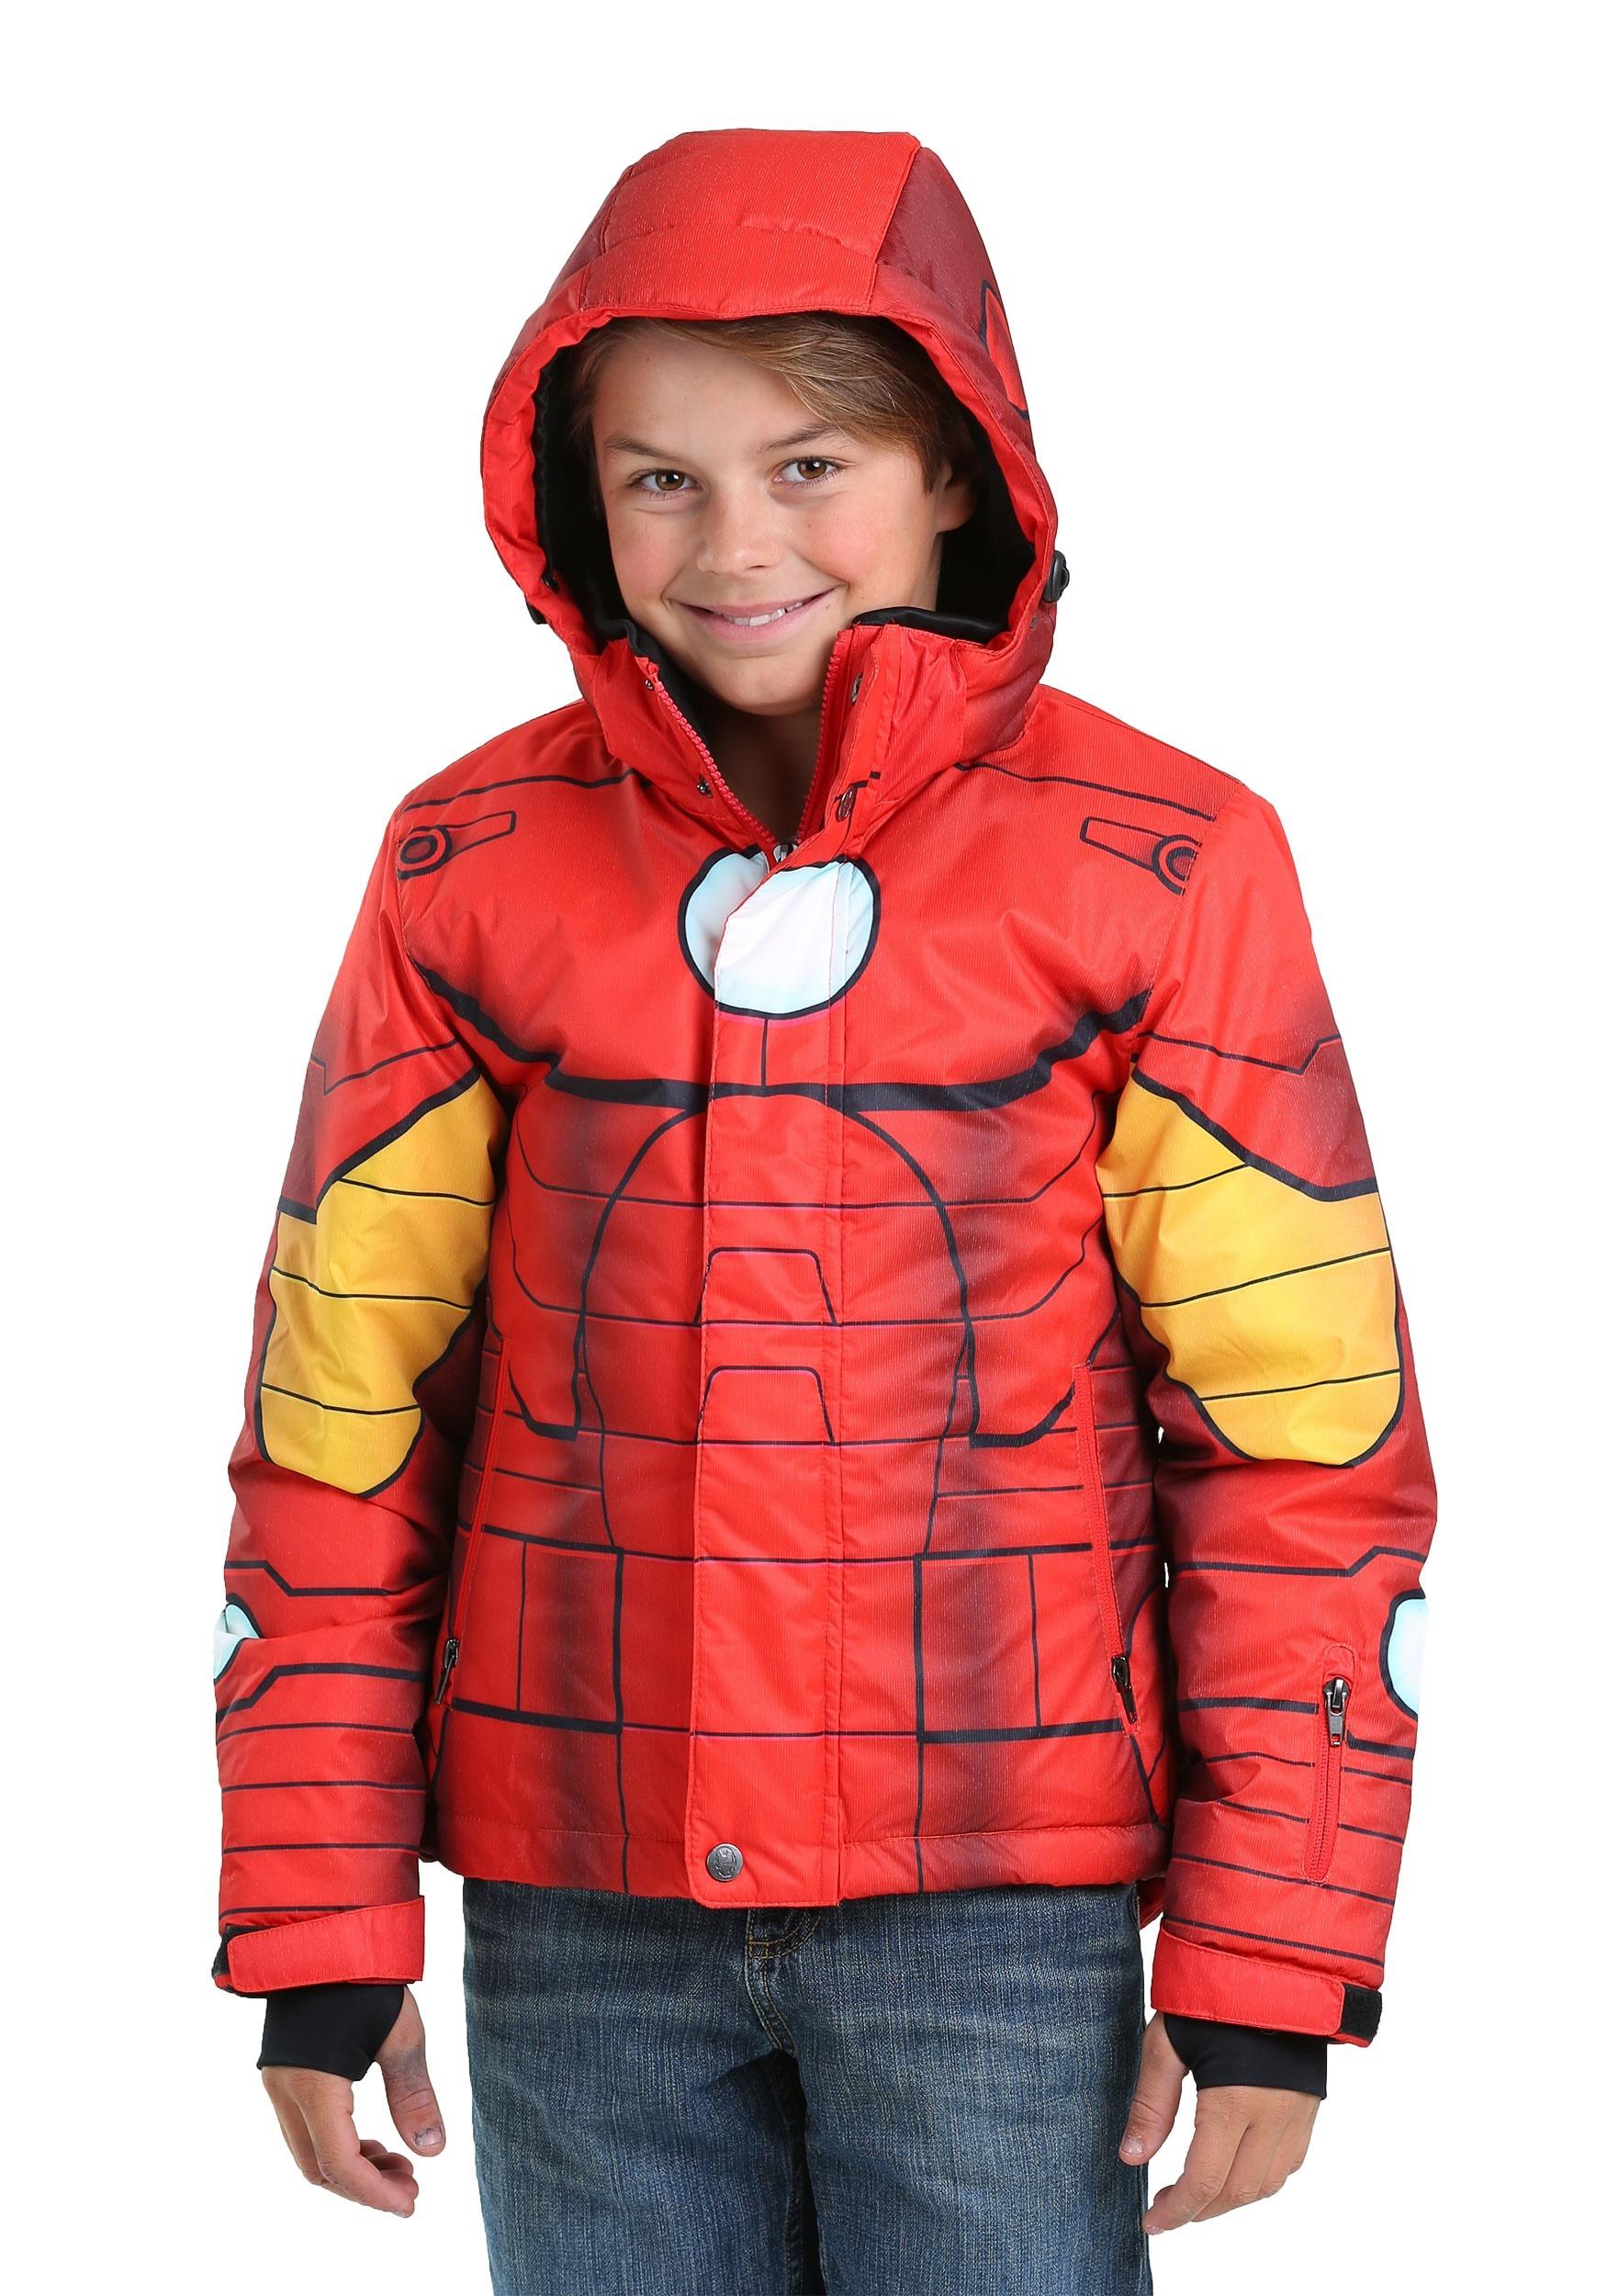 Iron Man Superhero Kids Snow Jacket